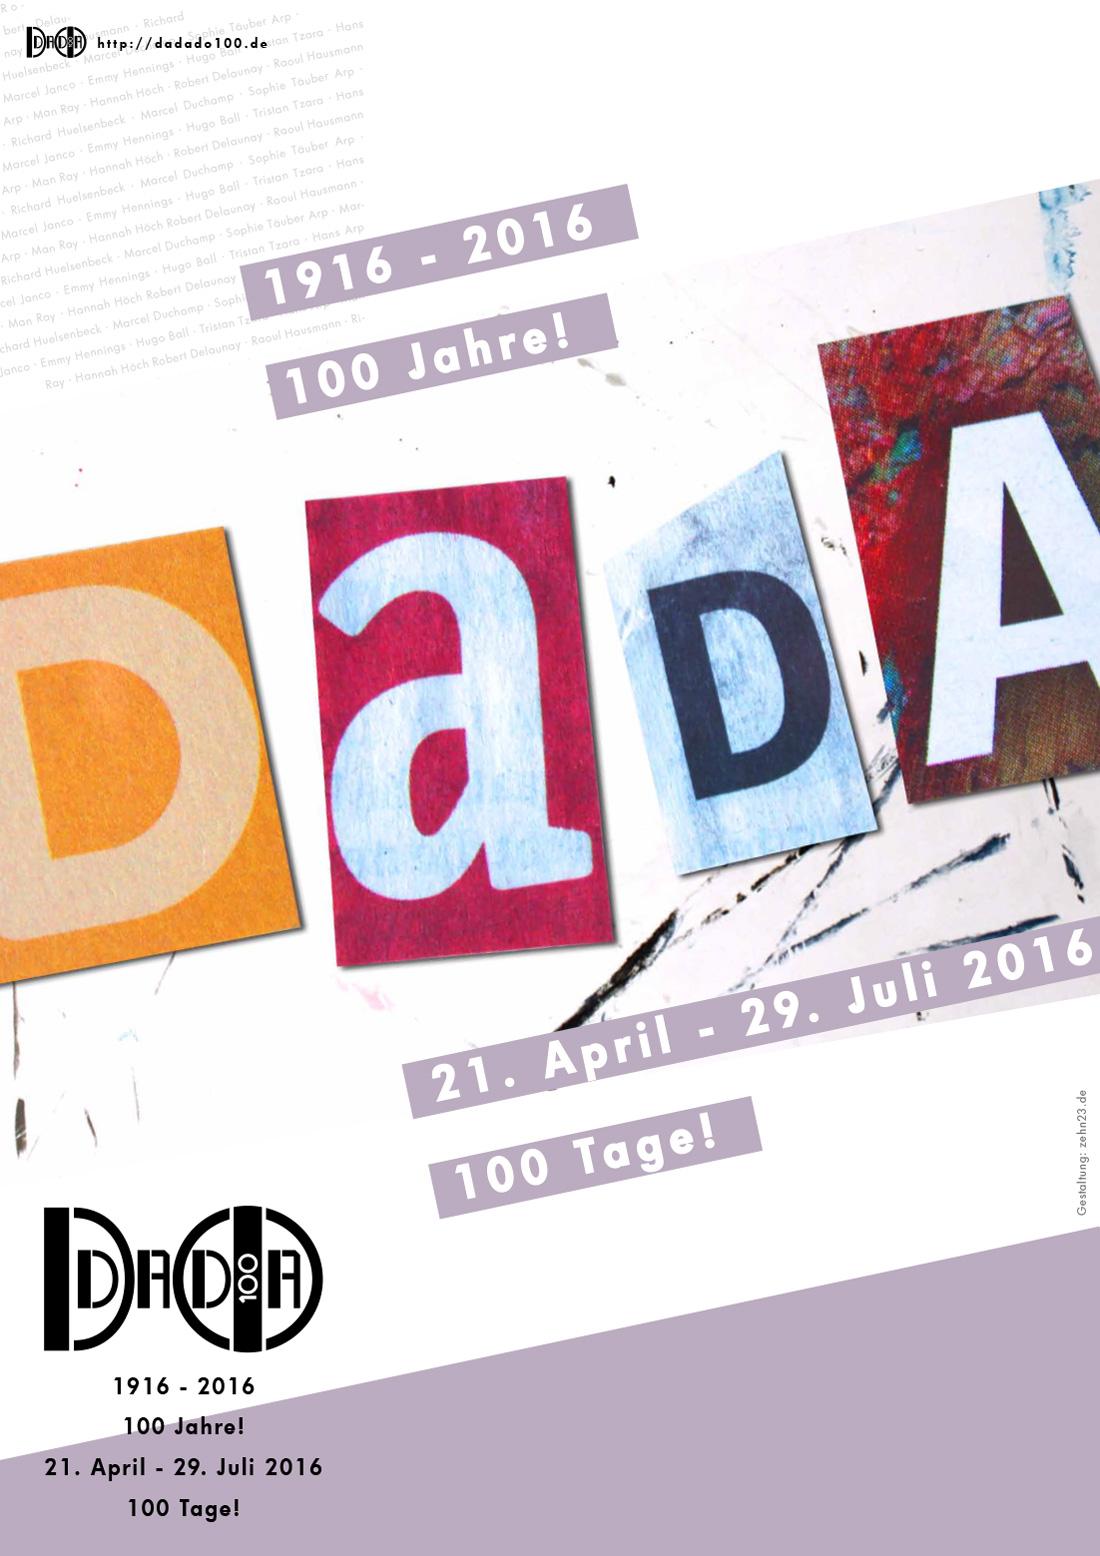 dadado100 Plakat Programm Flyer